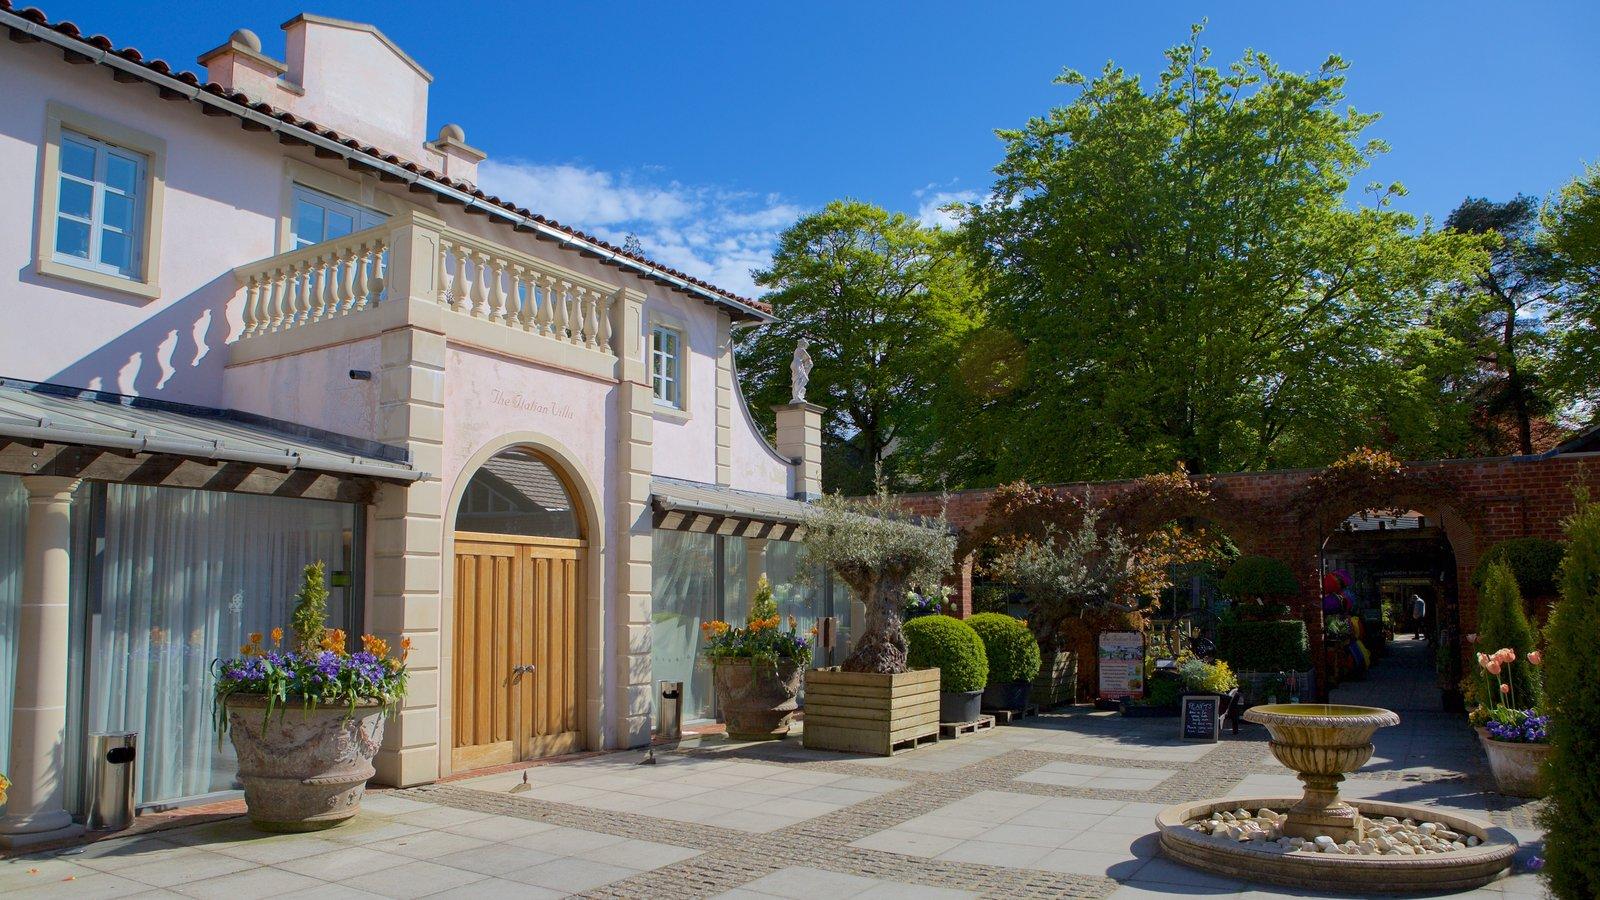 Poole caracterizando arquitetura de patrimônio